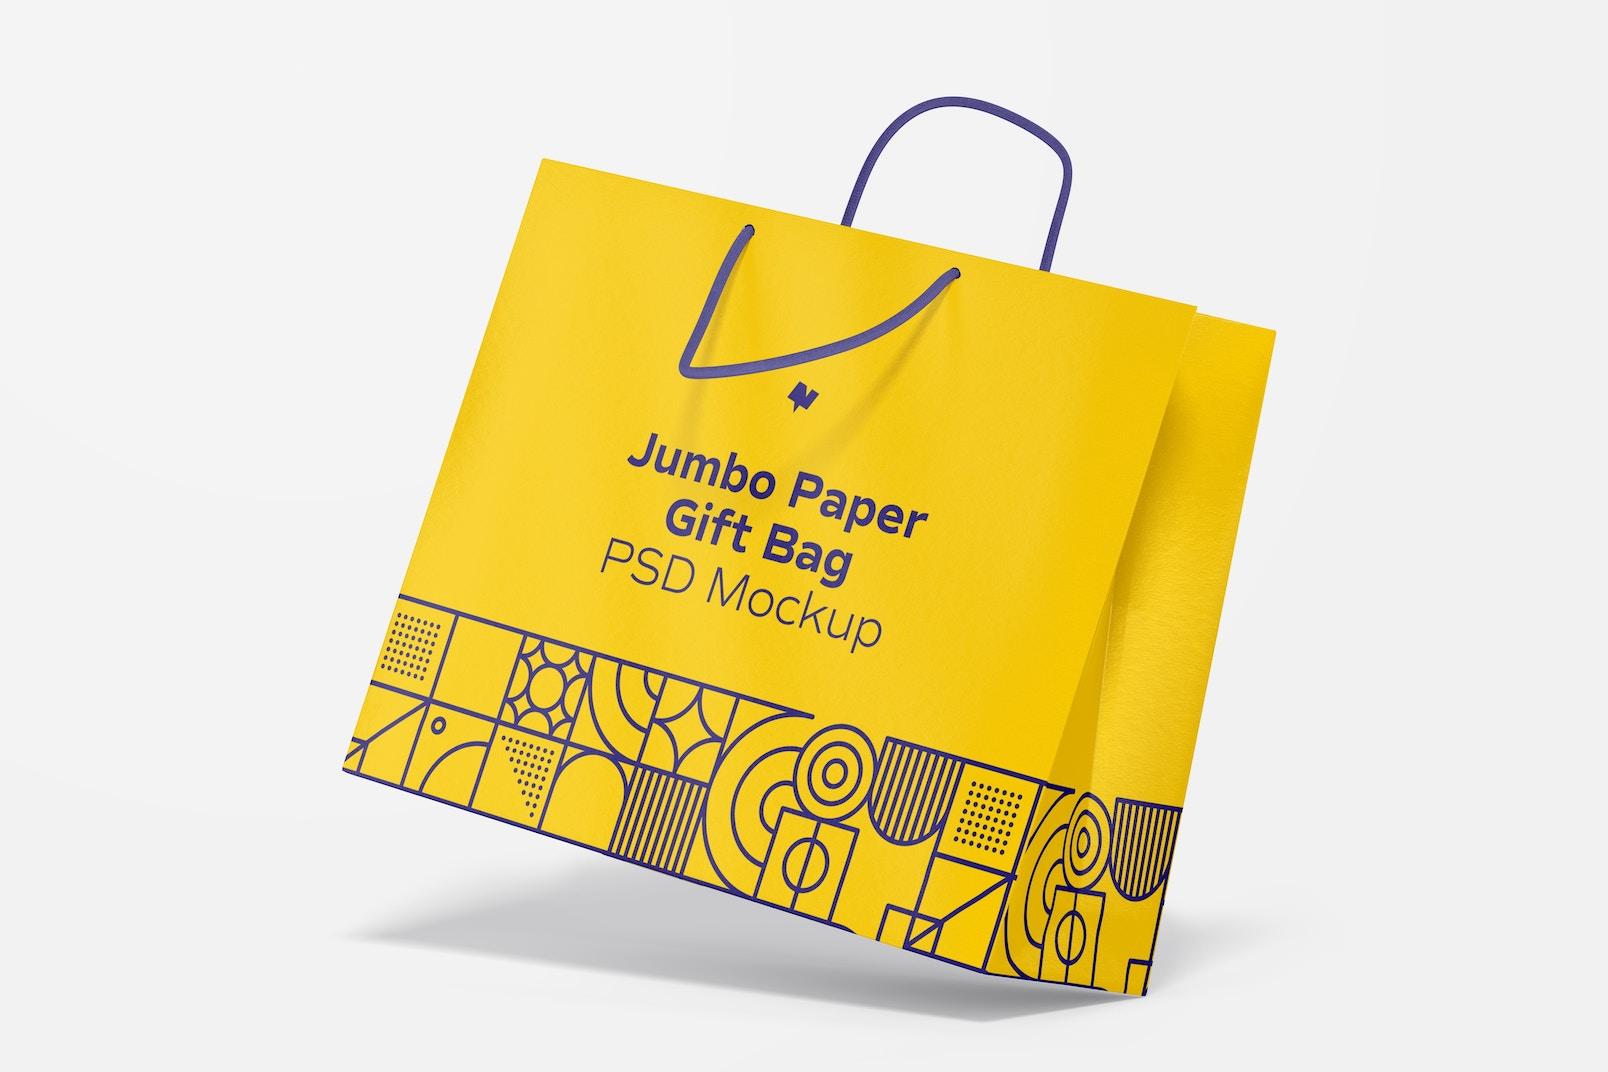 Jumbo Paper Gift Bag With Rope Handle Mockup, Perspective